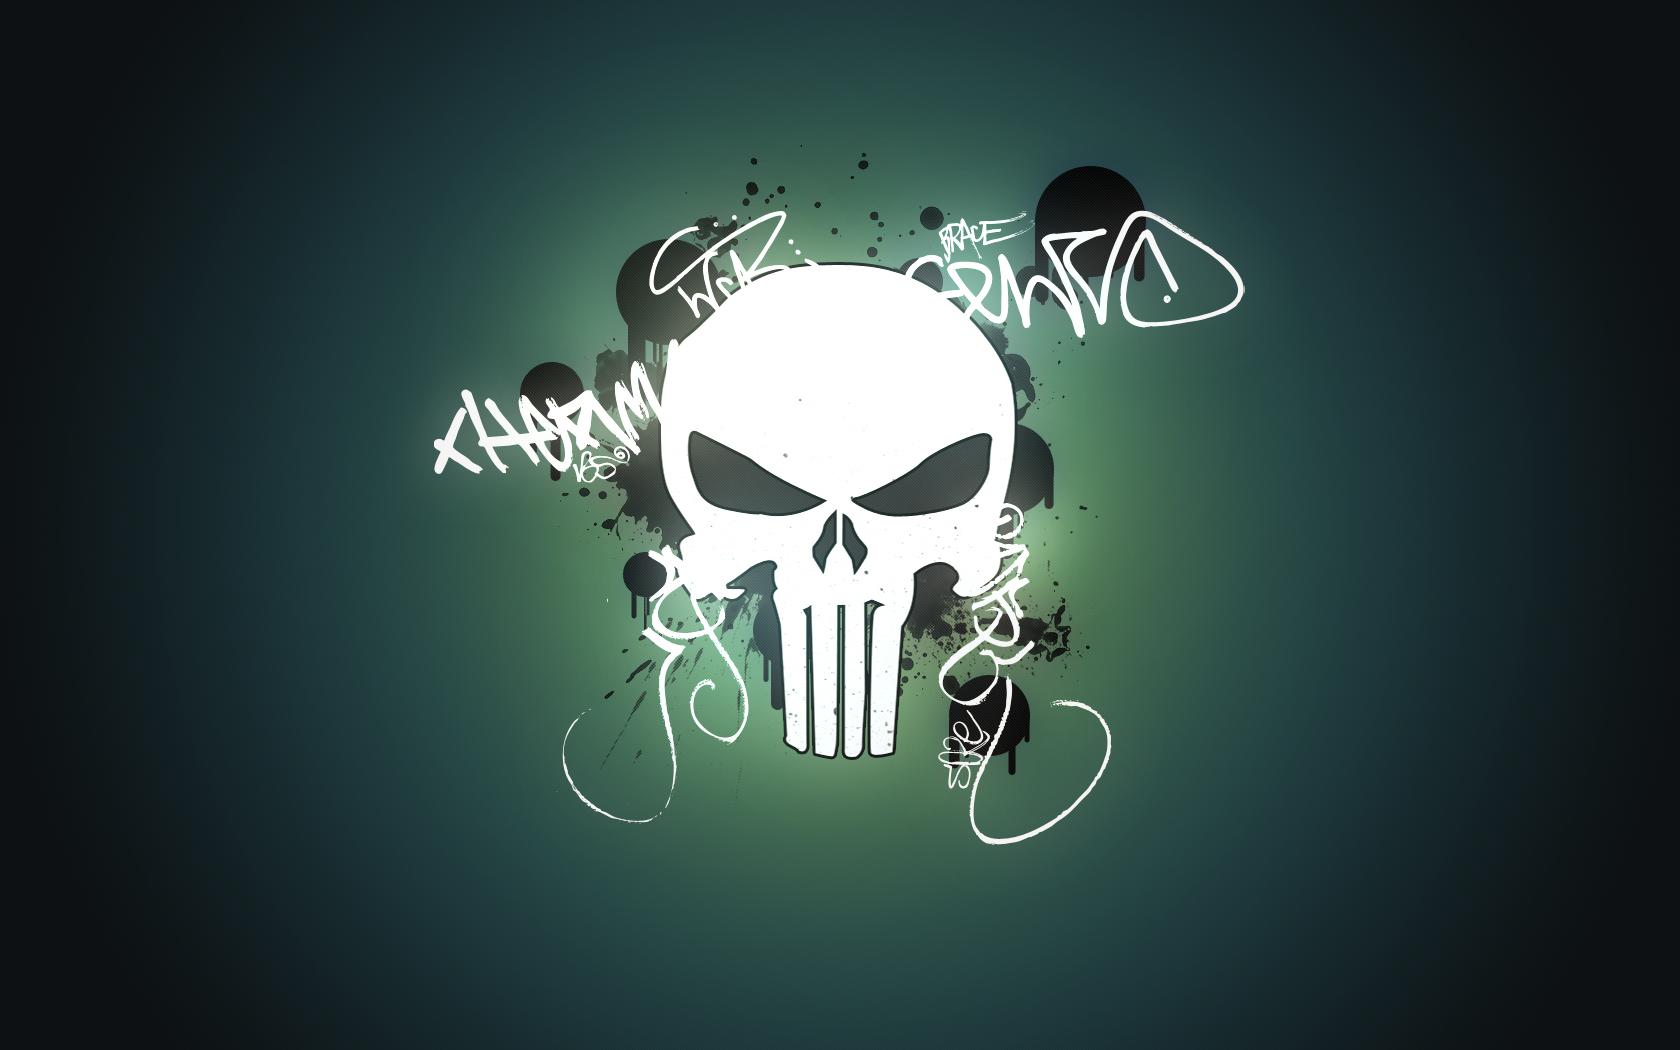 Punisher logo wallpaper Wallpaper Wide HD 1680x1050